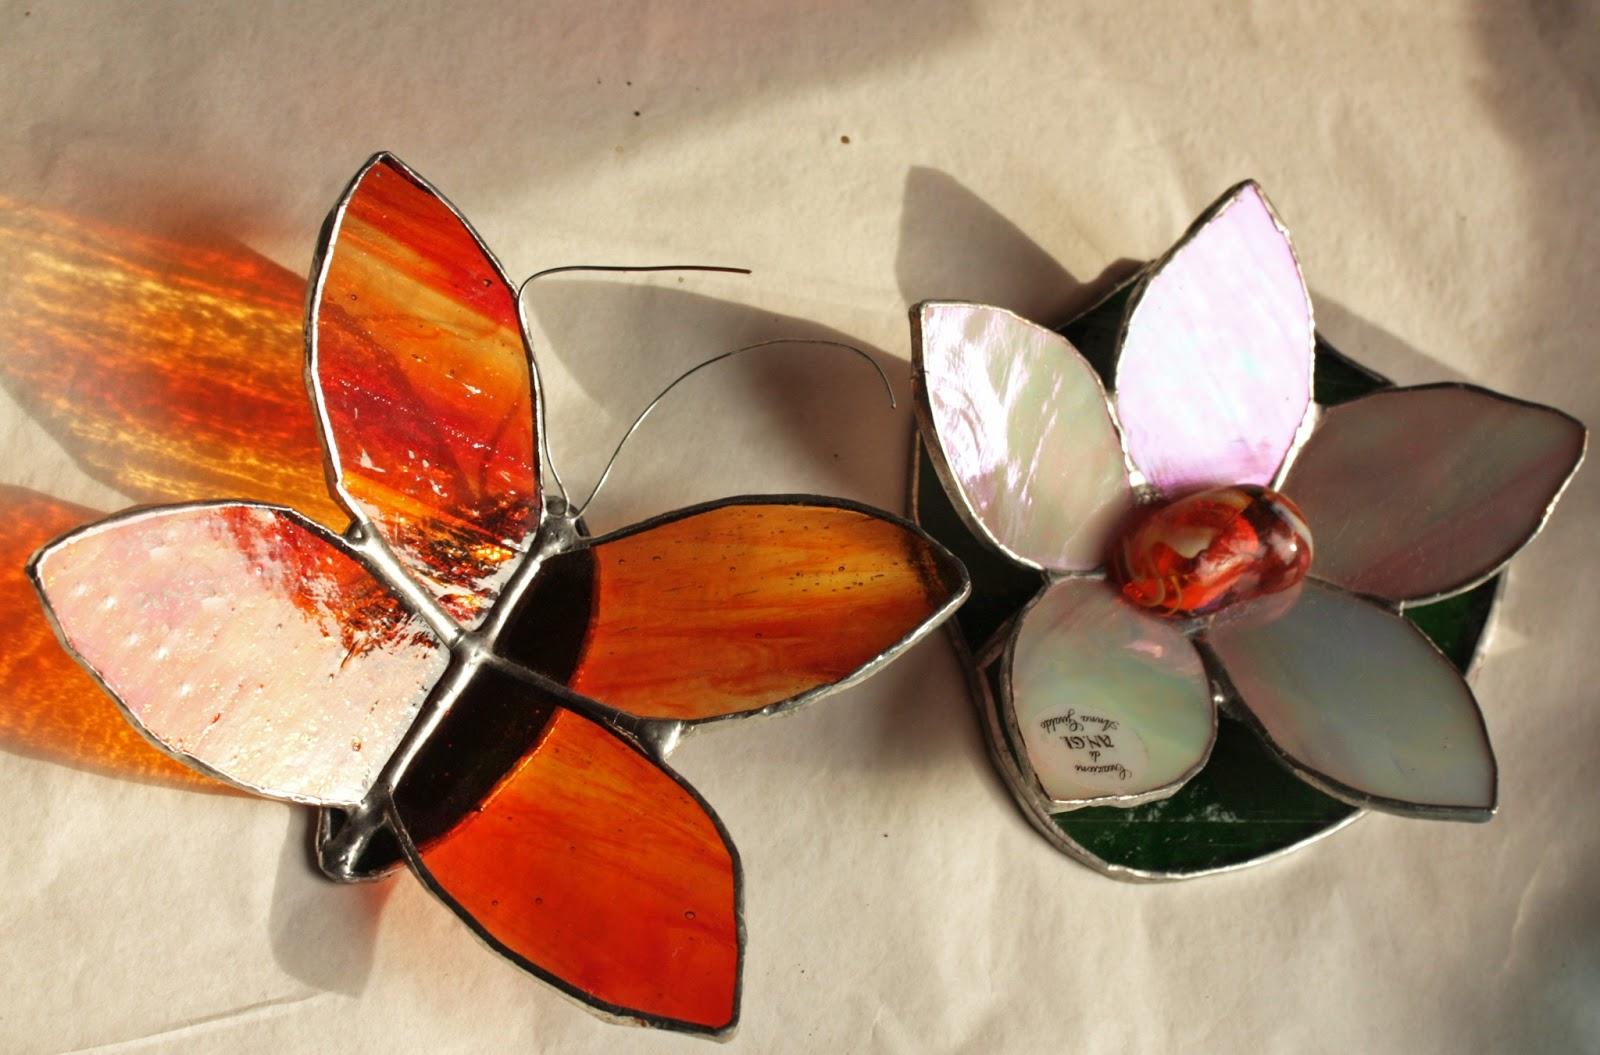 Lampade In Vetro Colorate : Cangini tucci piantana h diametro cangini e tucci lampada